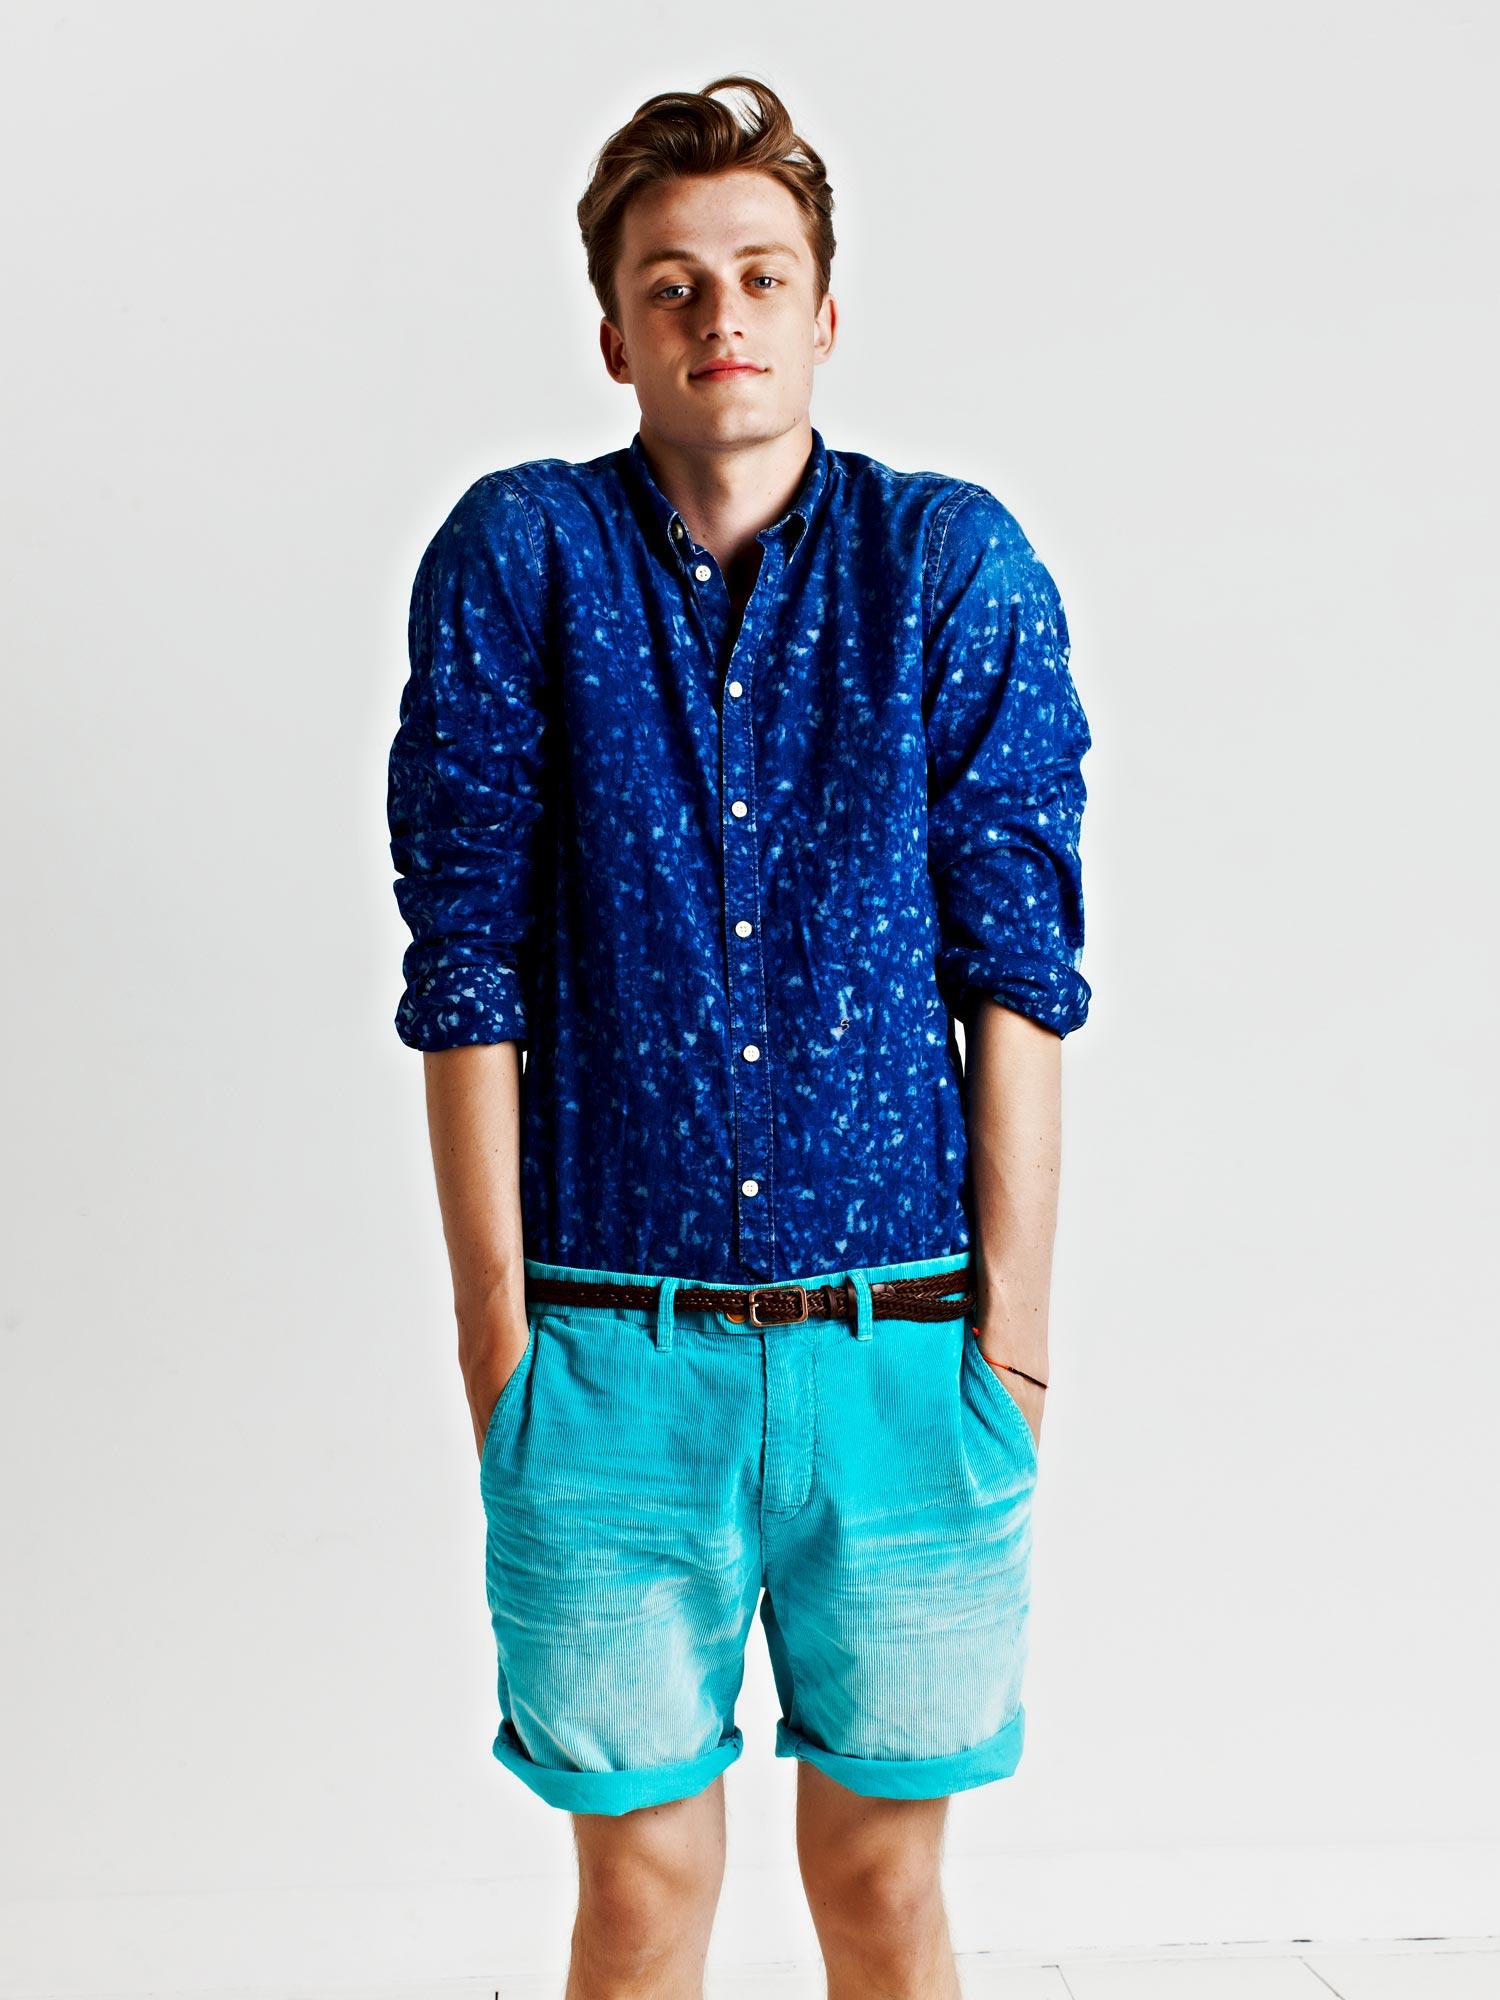 Bastiaan Van Gaalen Appears in Scotch & Soda's Spring/Summer 2013 Lookbook